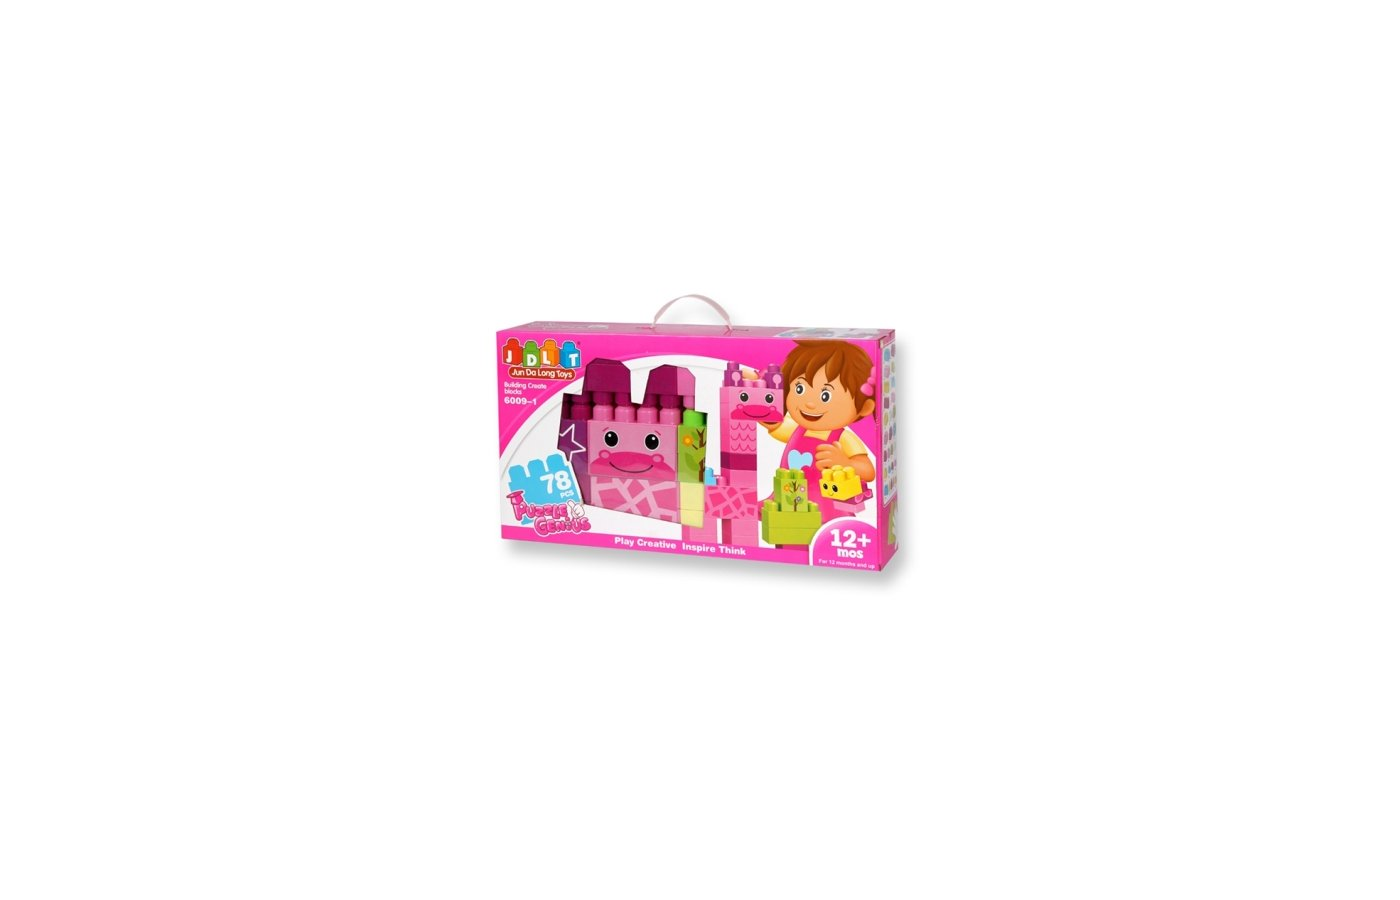 Конструктор JDLT 6009-1 Пазлы для девочек